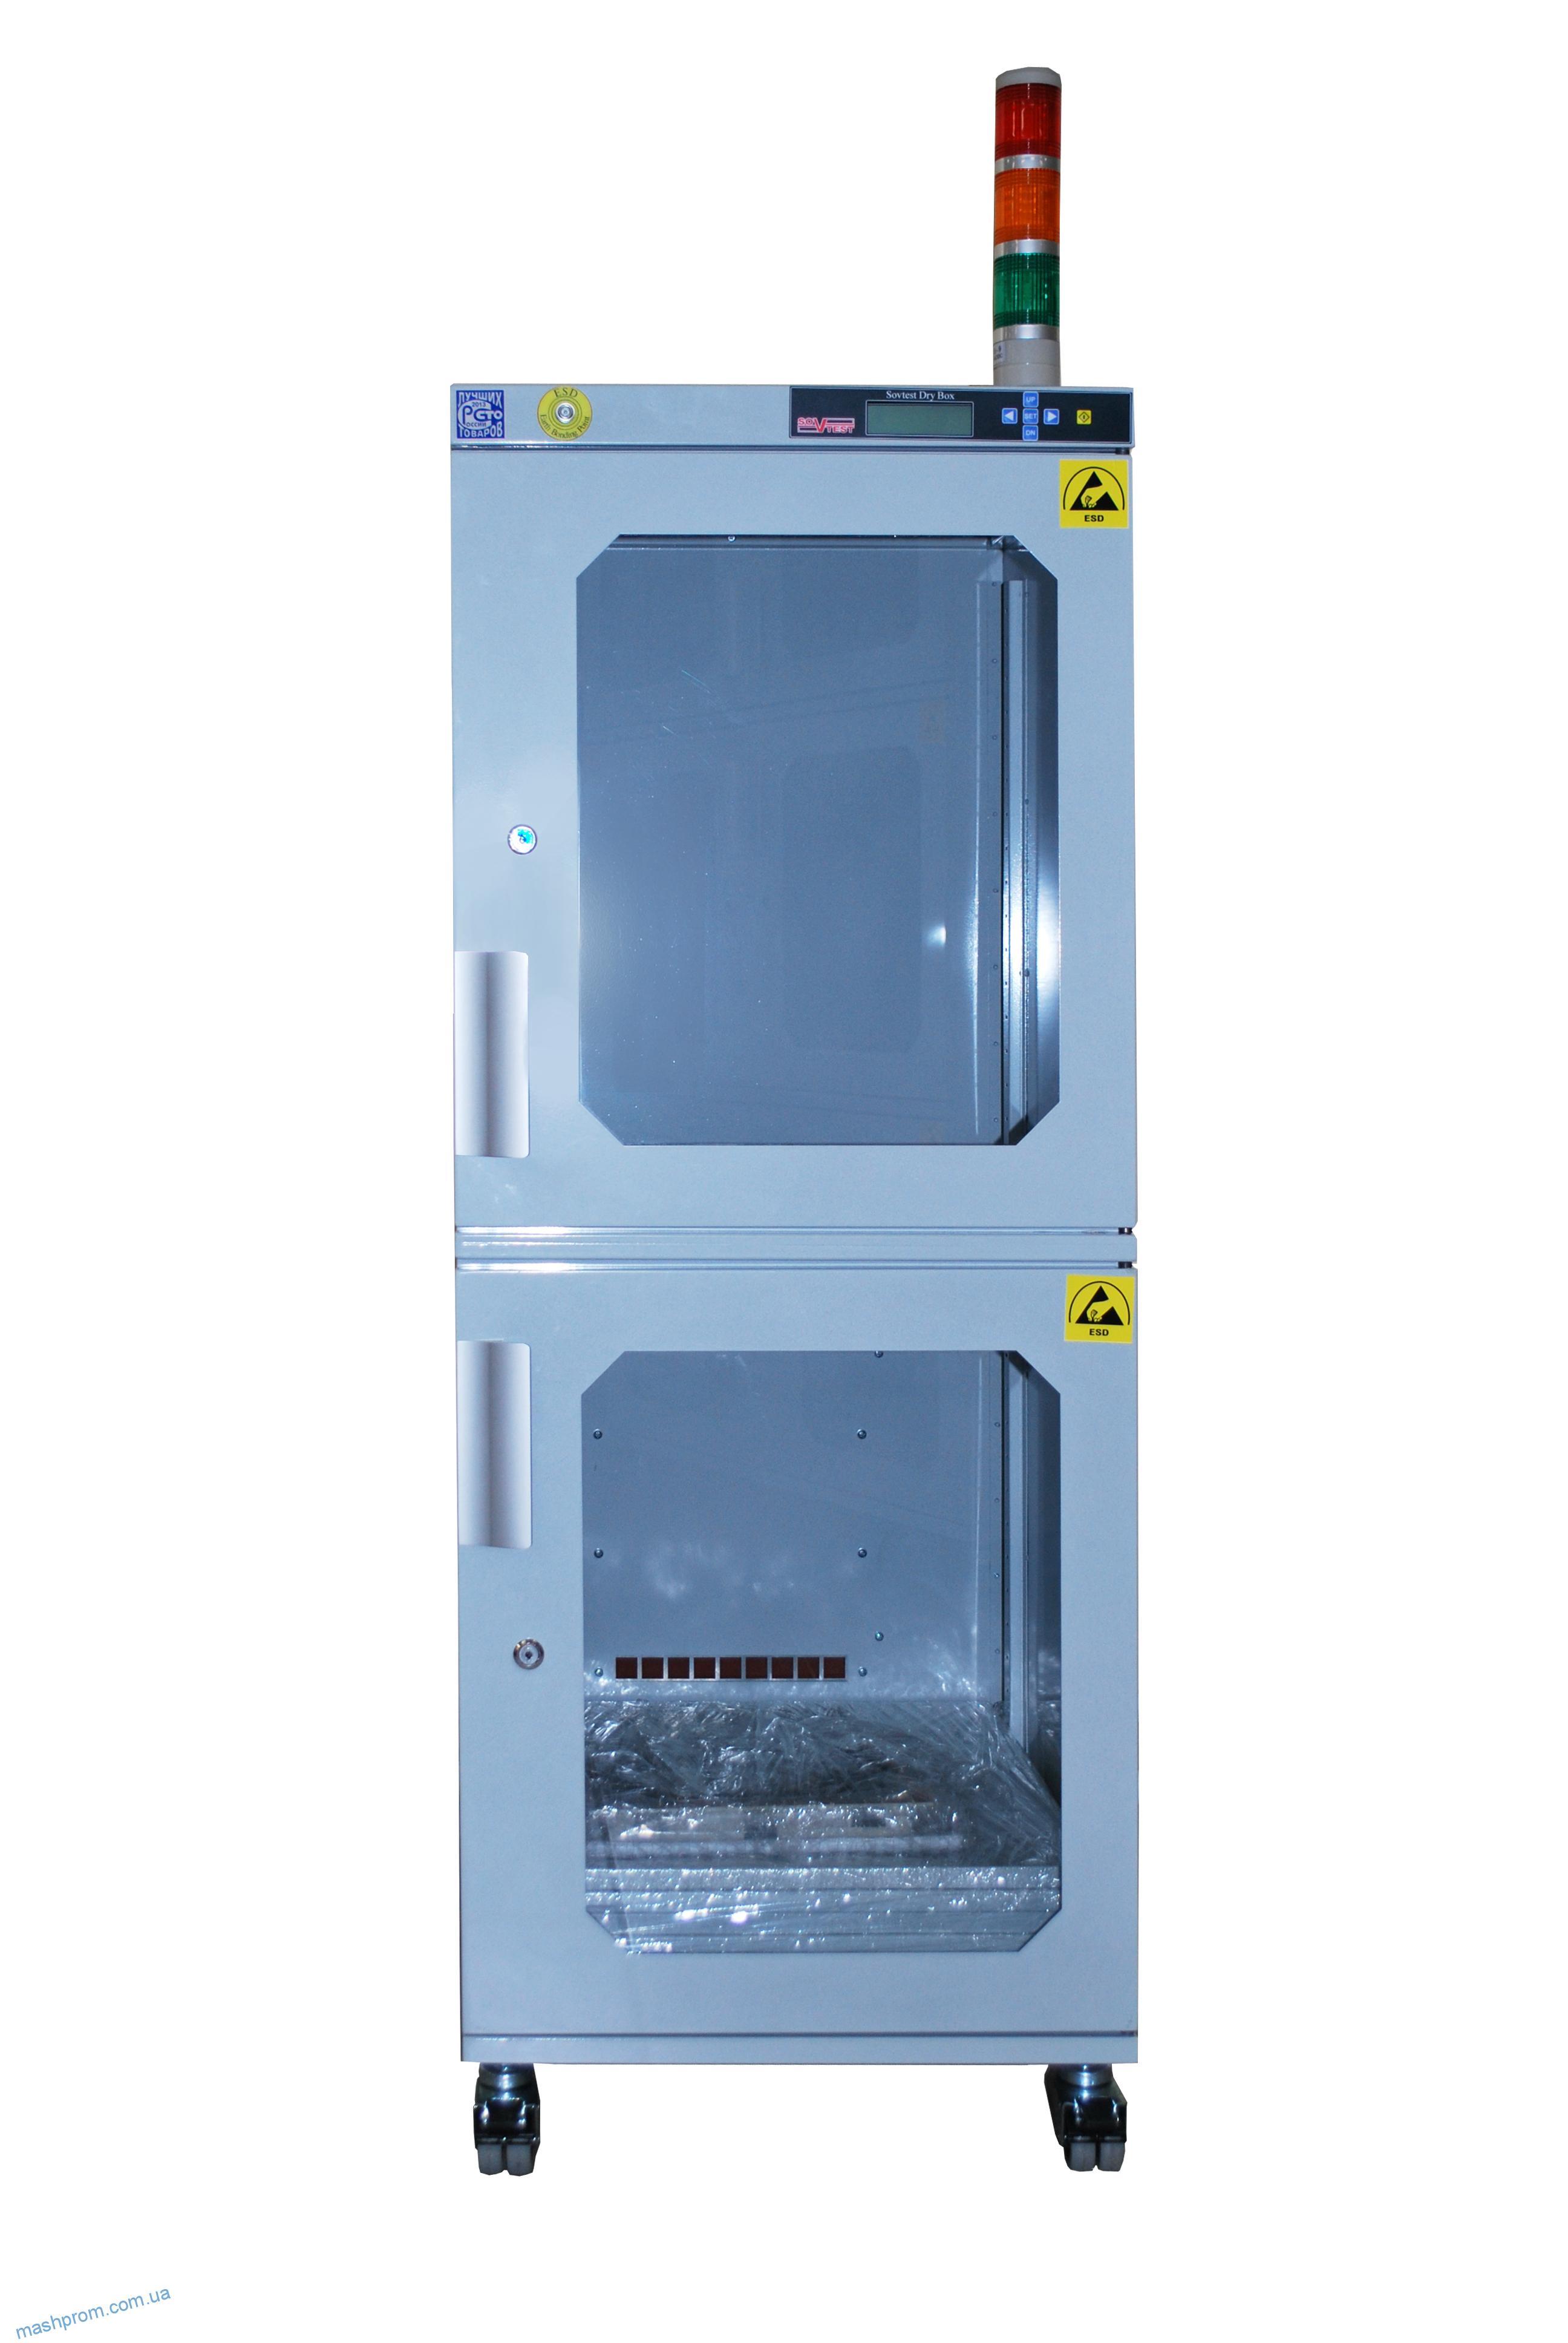 Шкаф сухого хранения SDB302 ДИ с функцией автоматизации